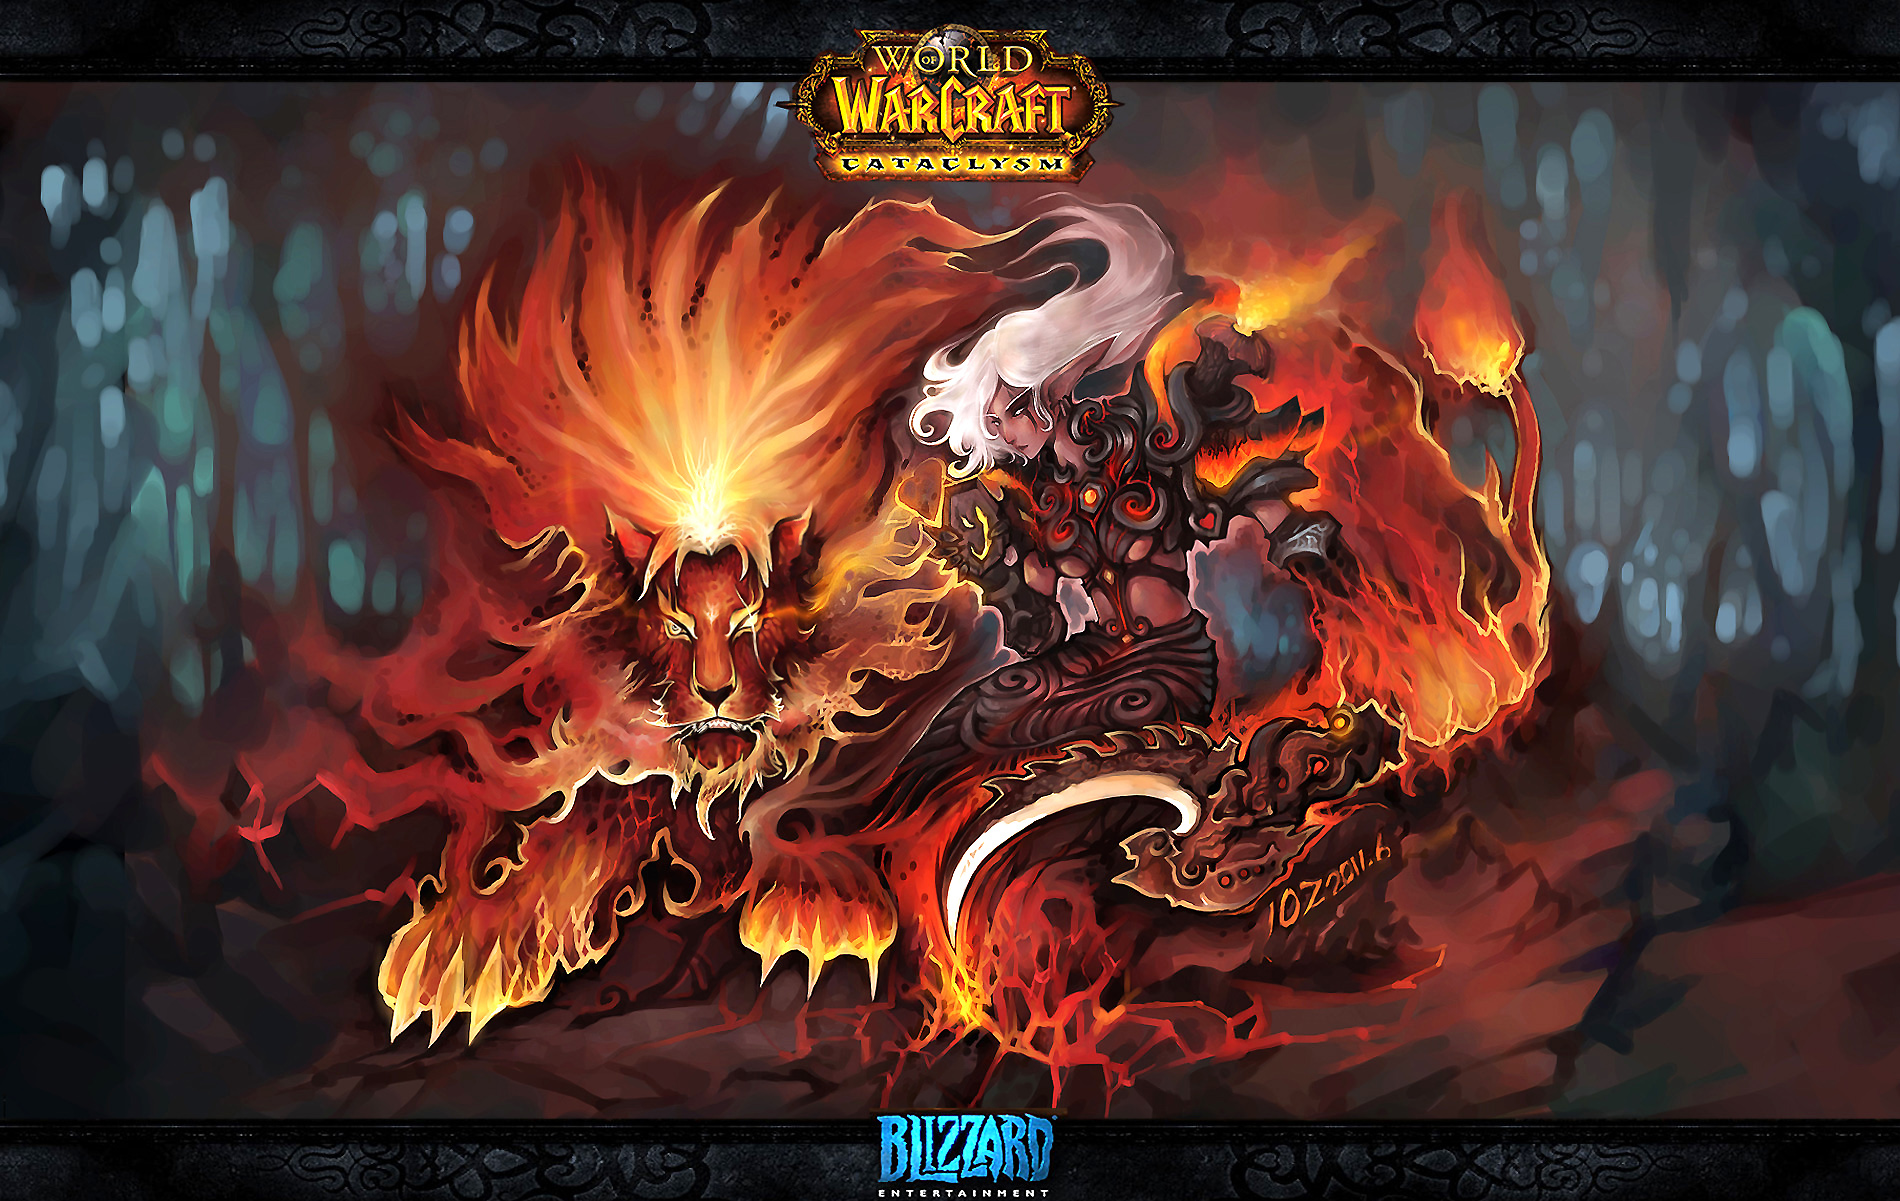 Goblin z World of Warcraft Noblegarden 800x480 - Wallpaper